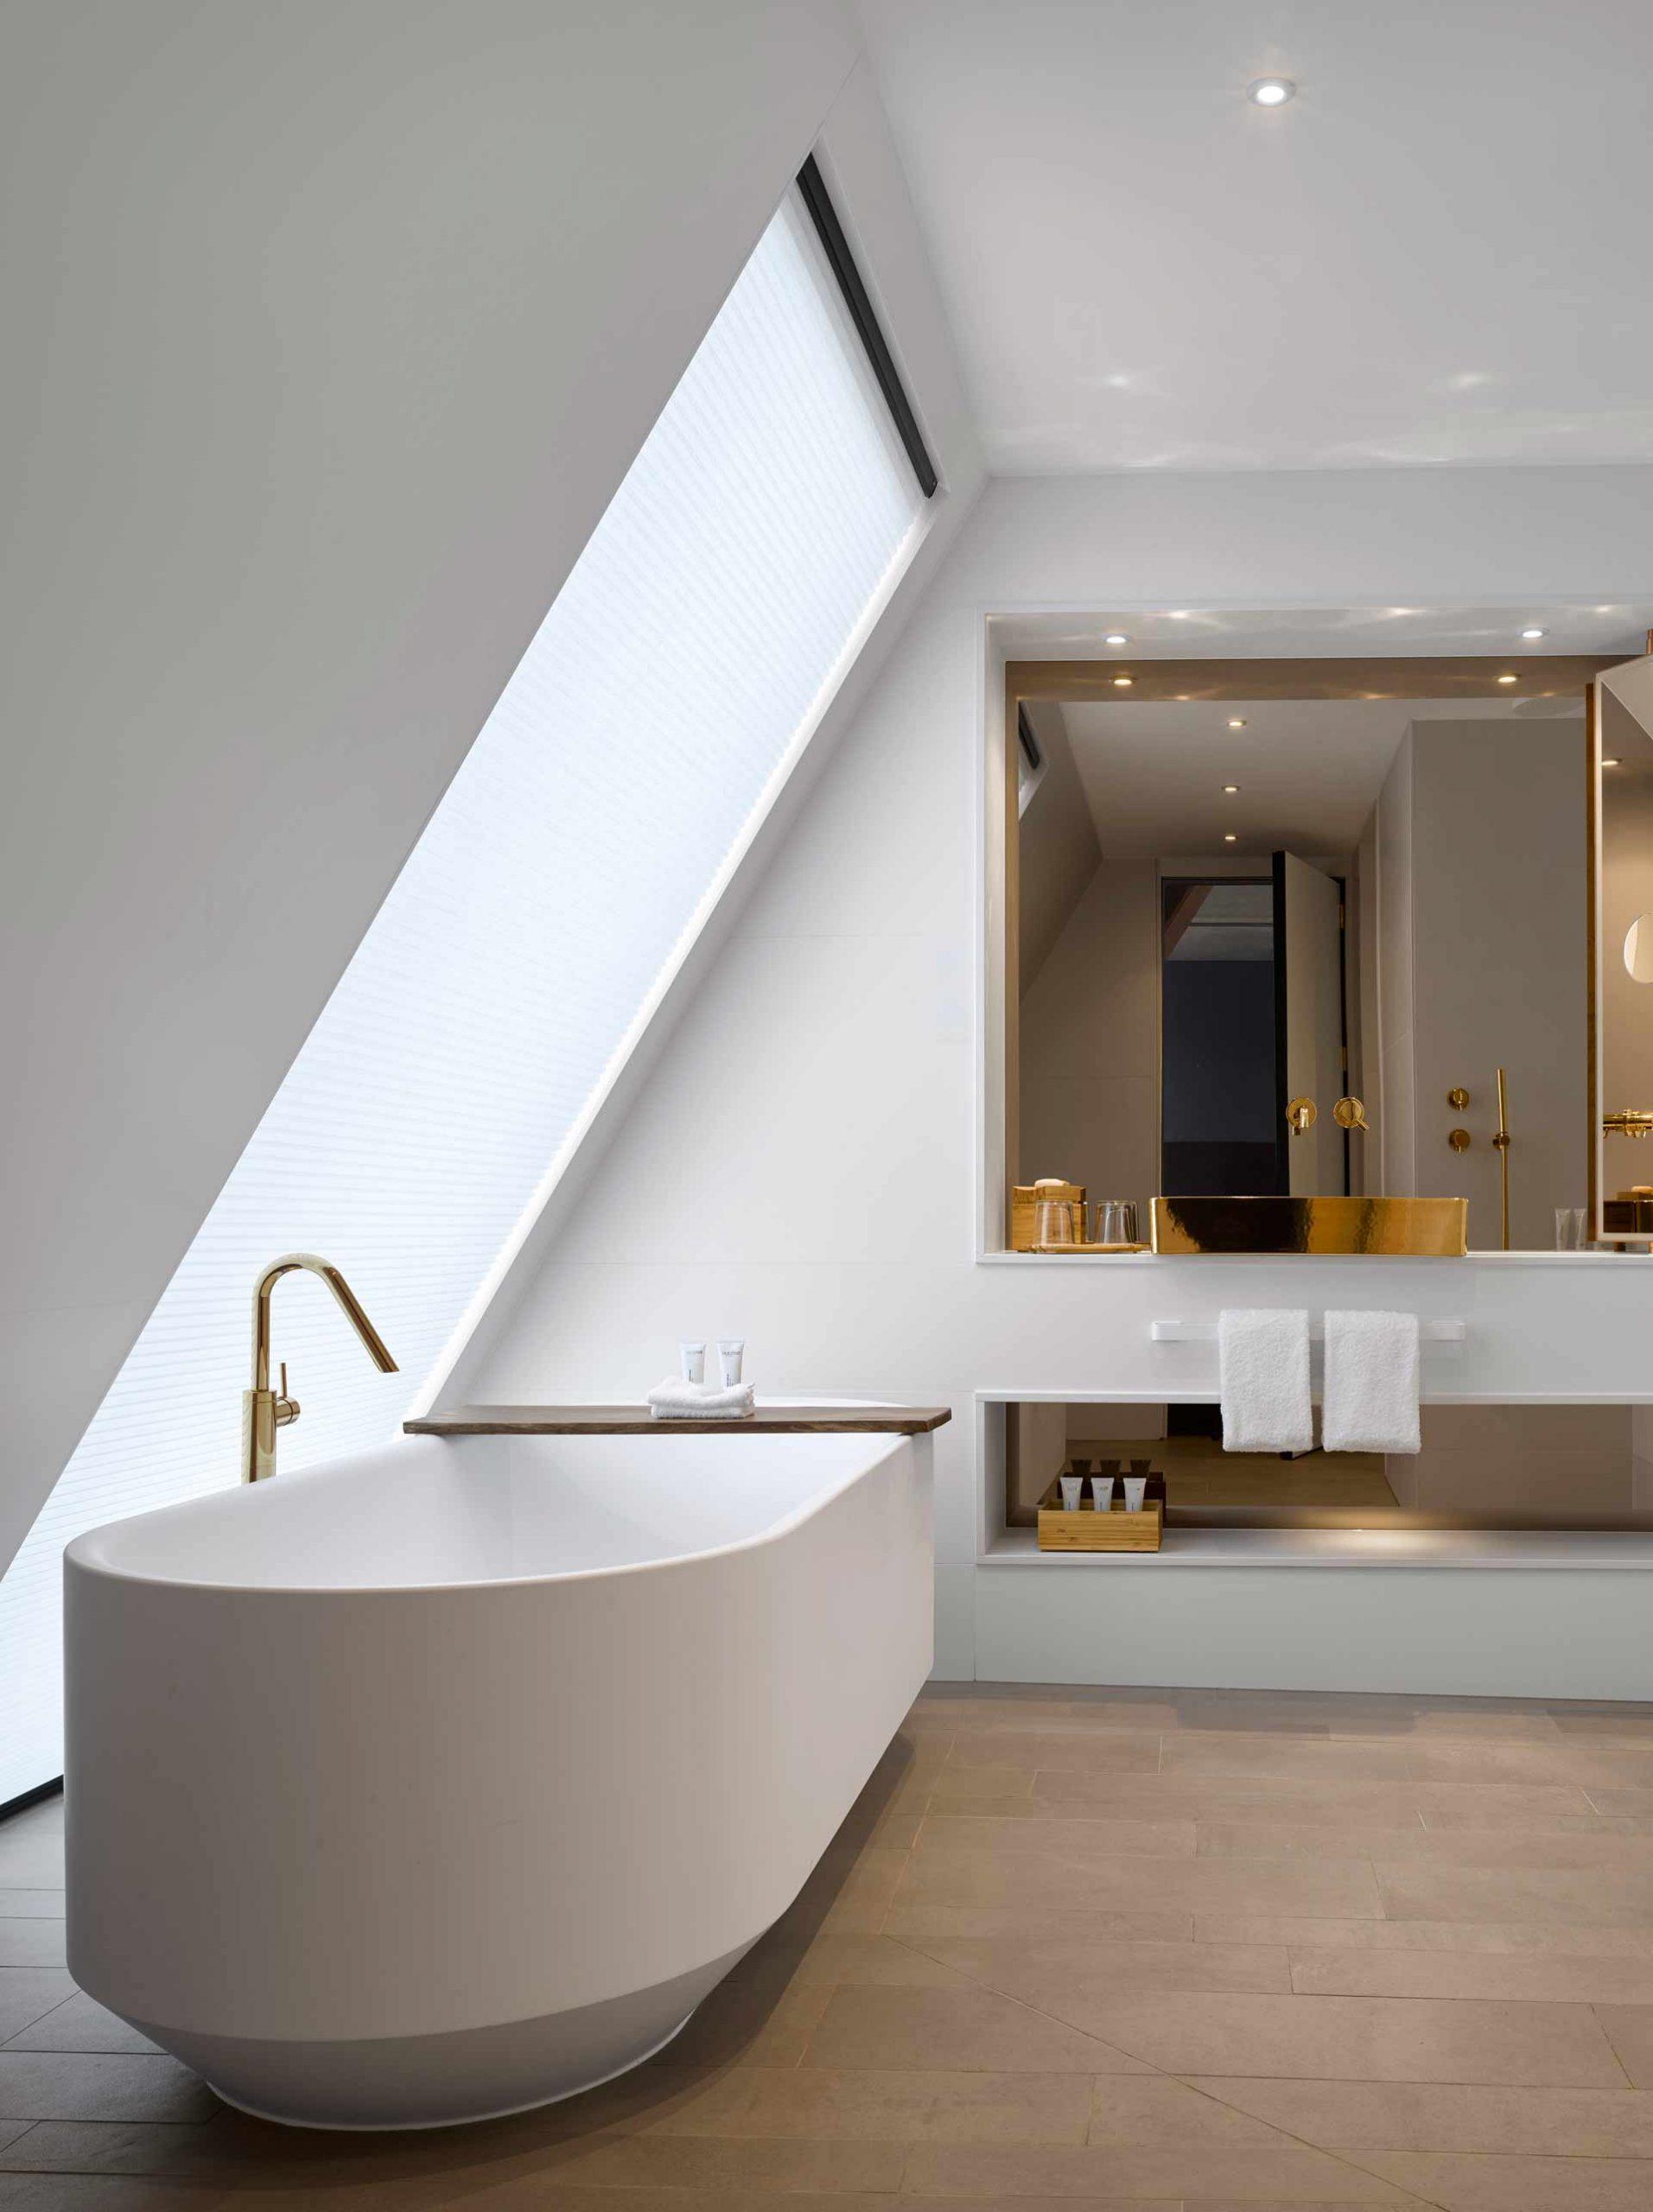 Will-Pryce-bathroom-nobu-interior-scaled-1